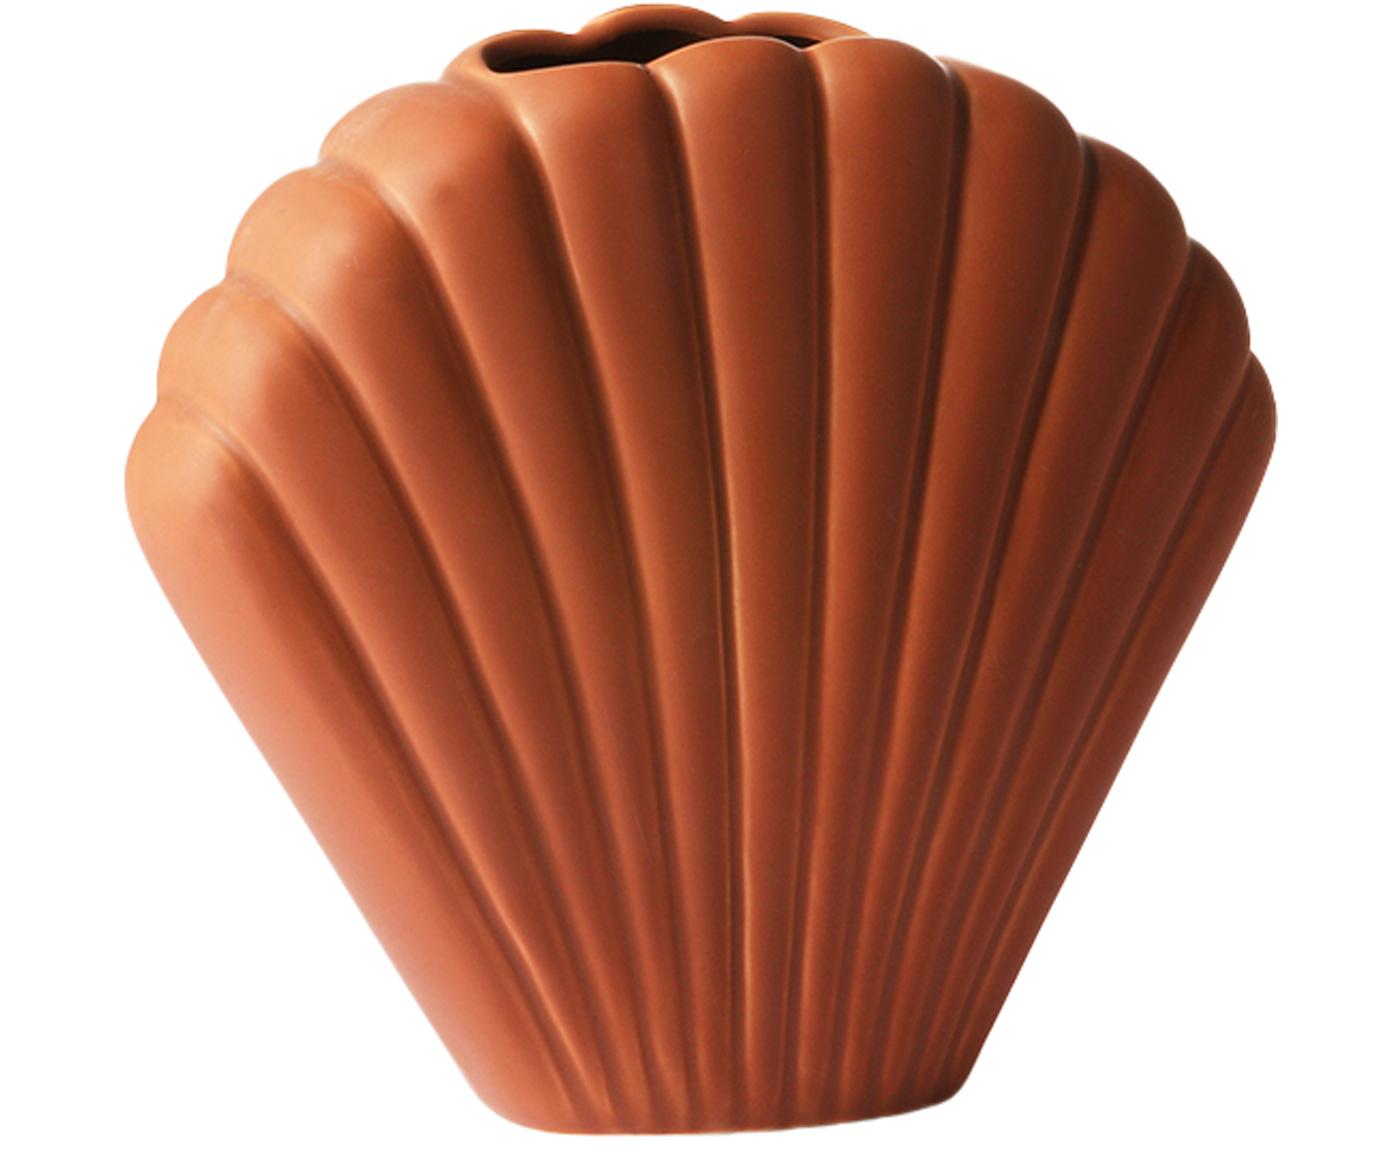 Vaas Shell van keramiek, Keramiek, Bruin, 18 x 20 cm